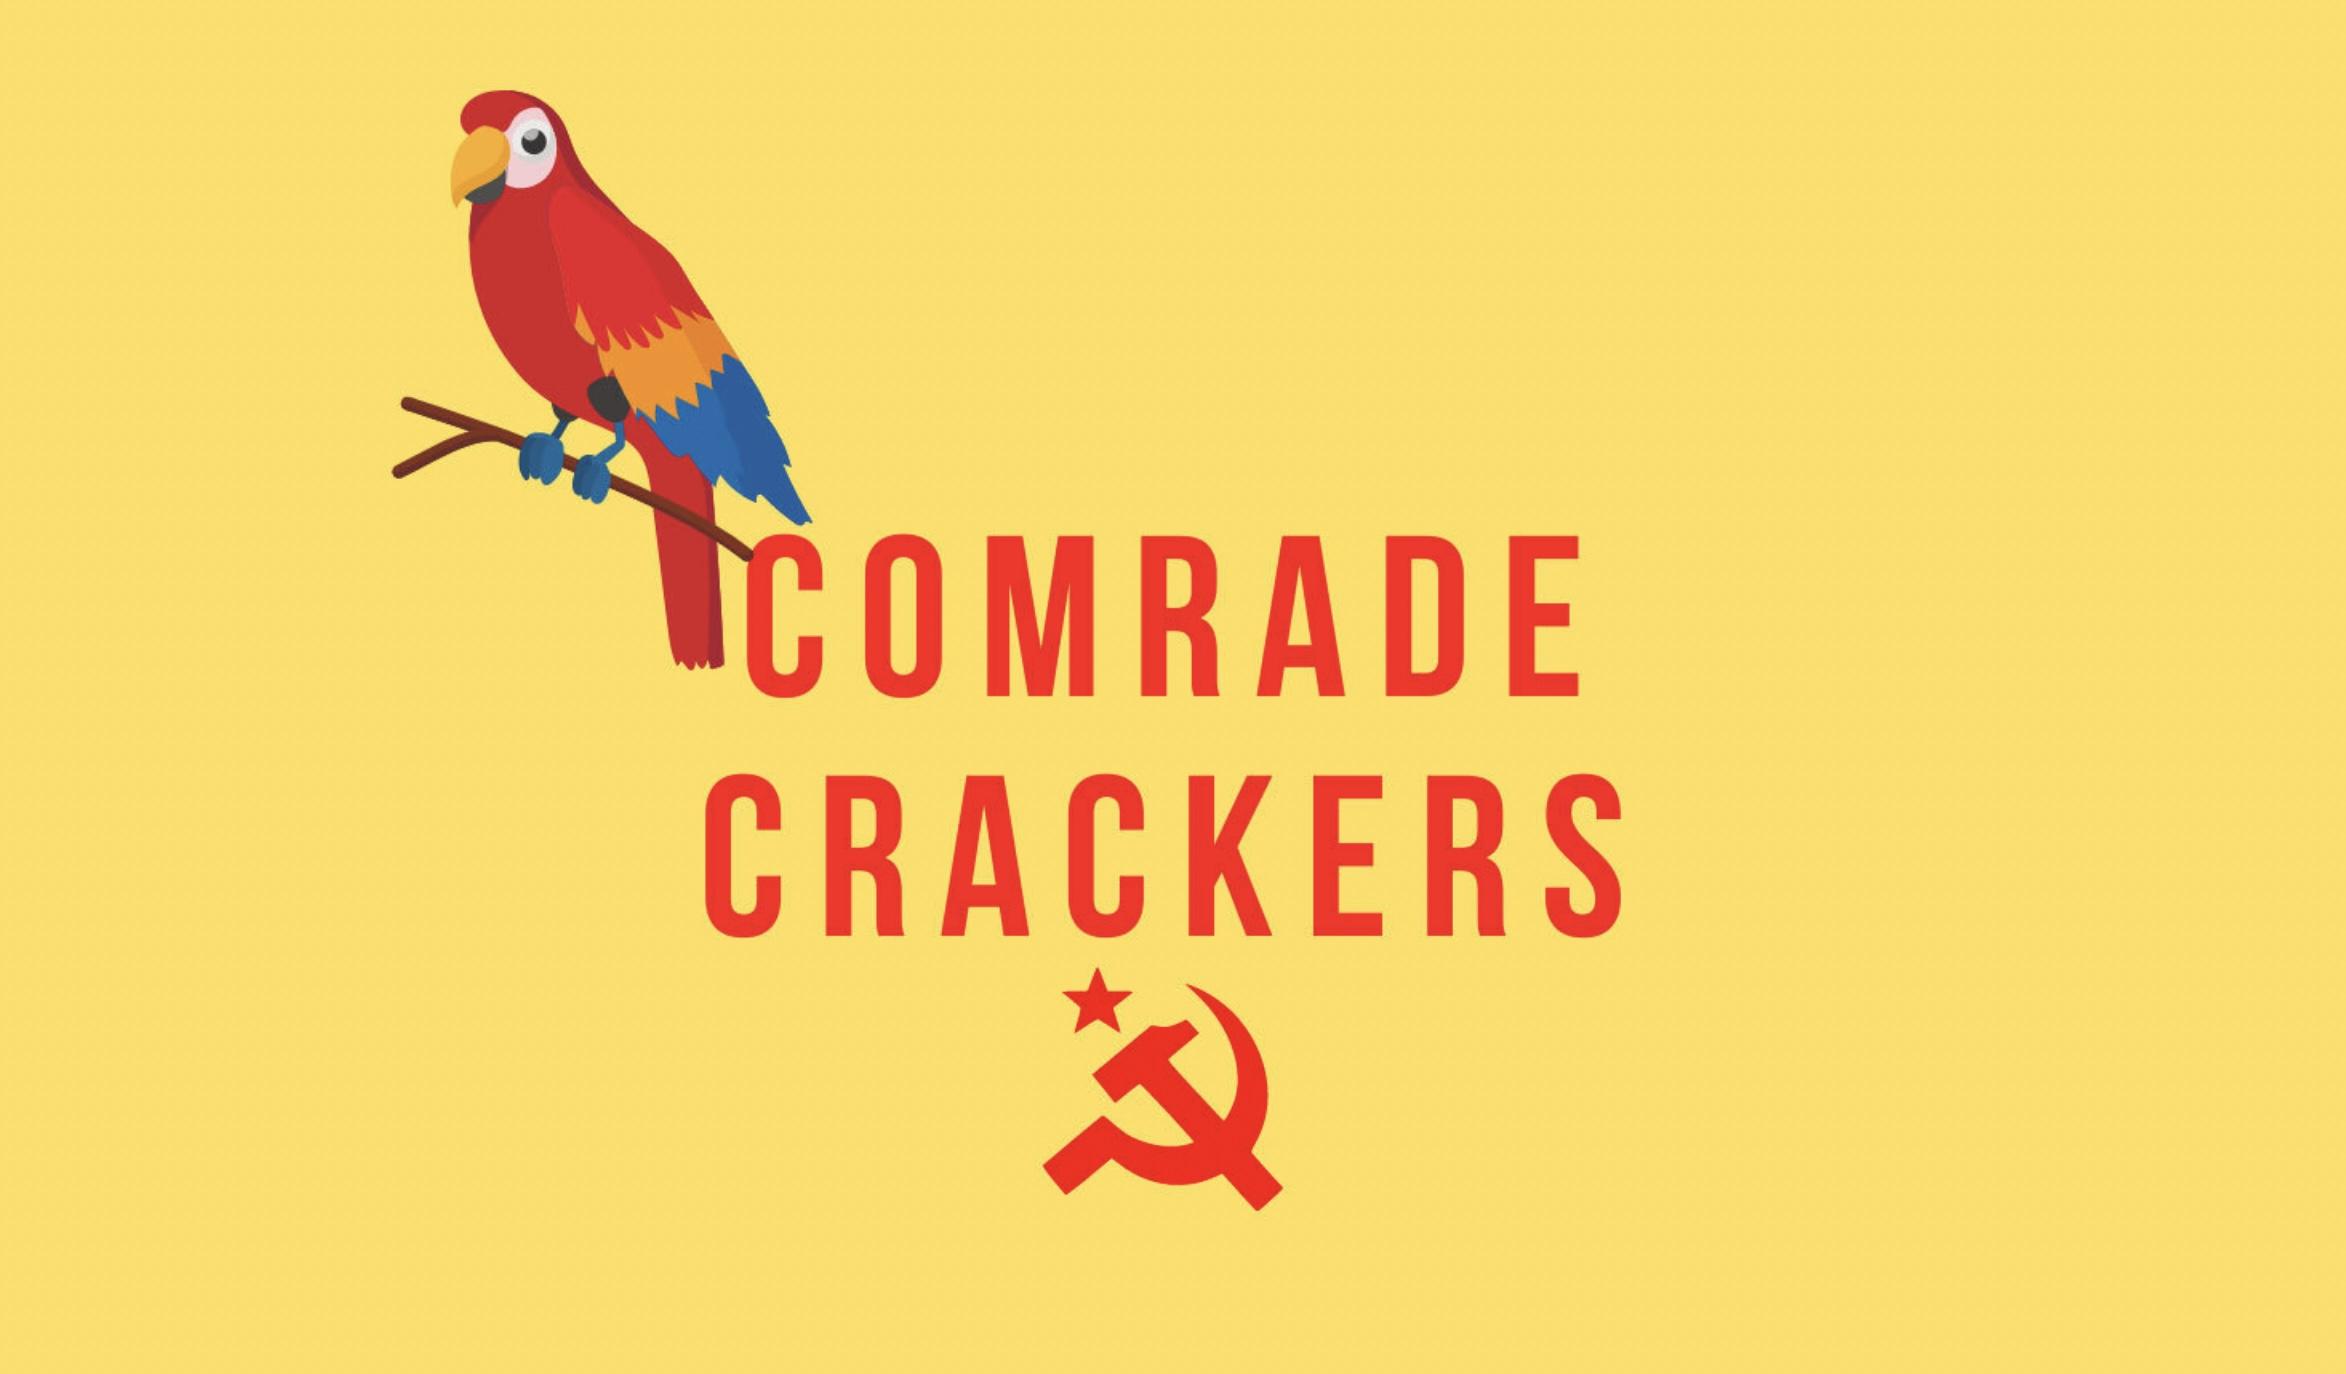 Site promises to teach your parrot to recite the Communist Manifesto